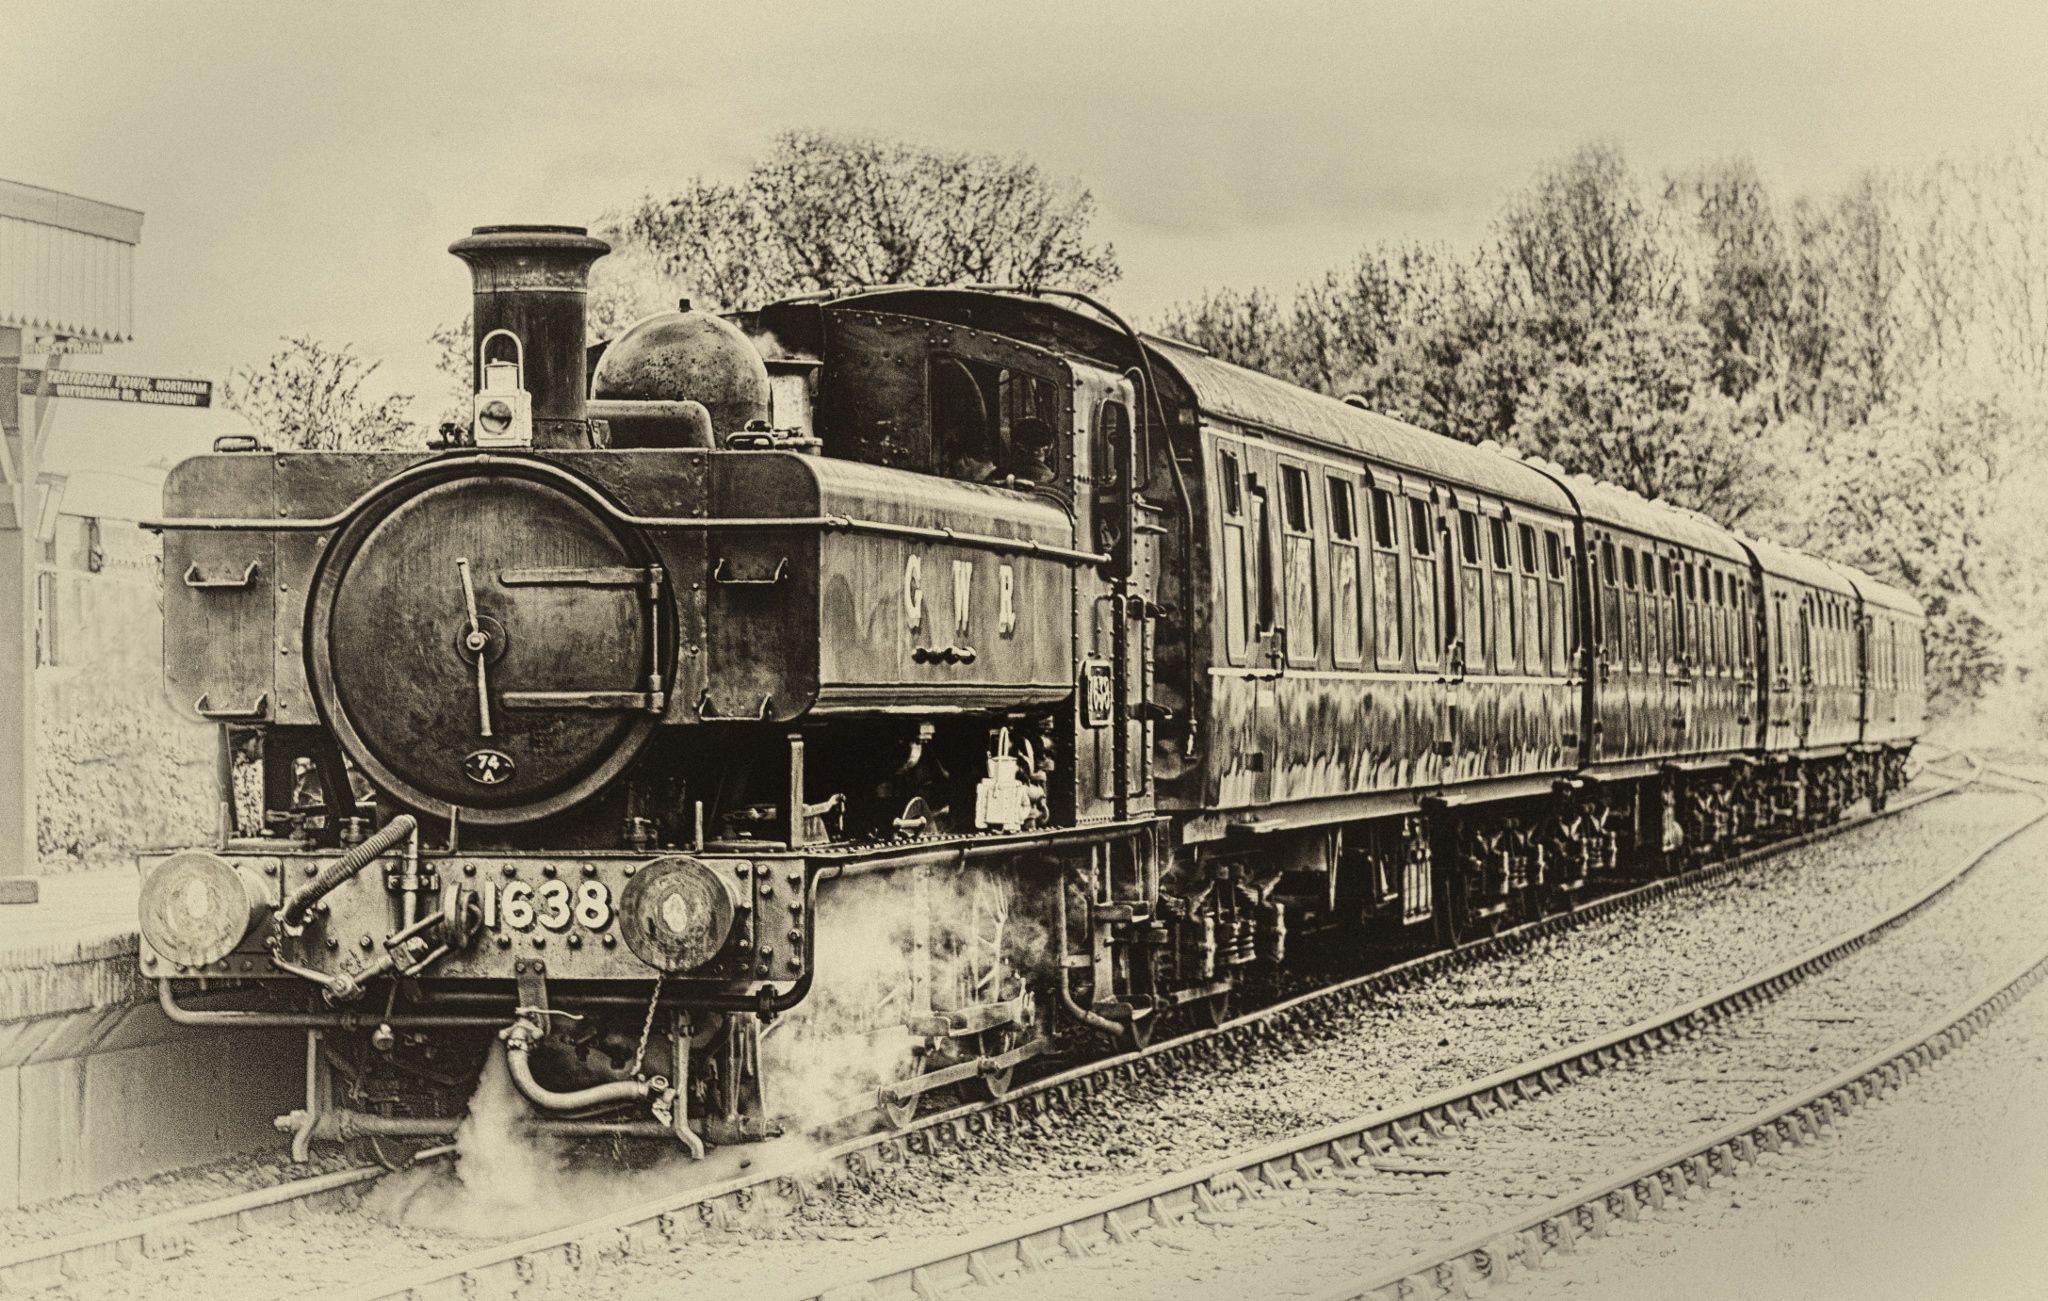 GWR 1638 by Nigel Jones on 500px